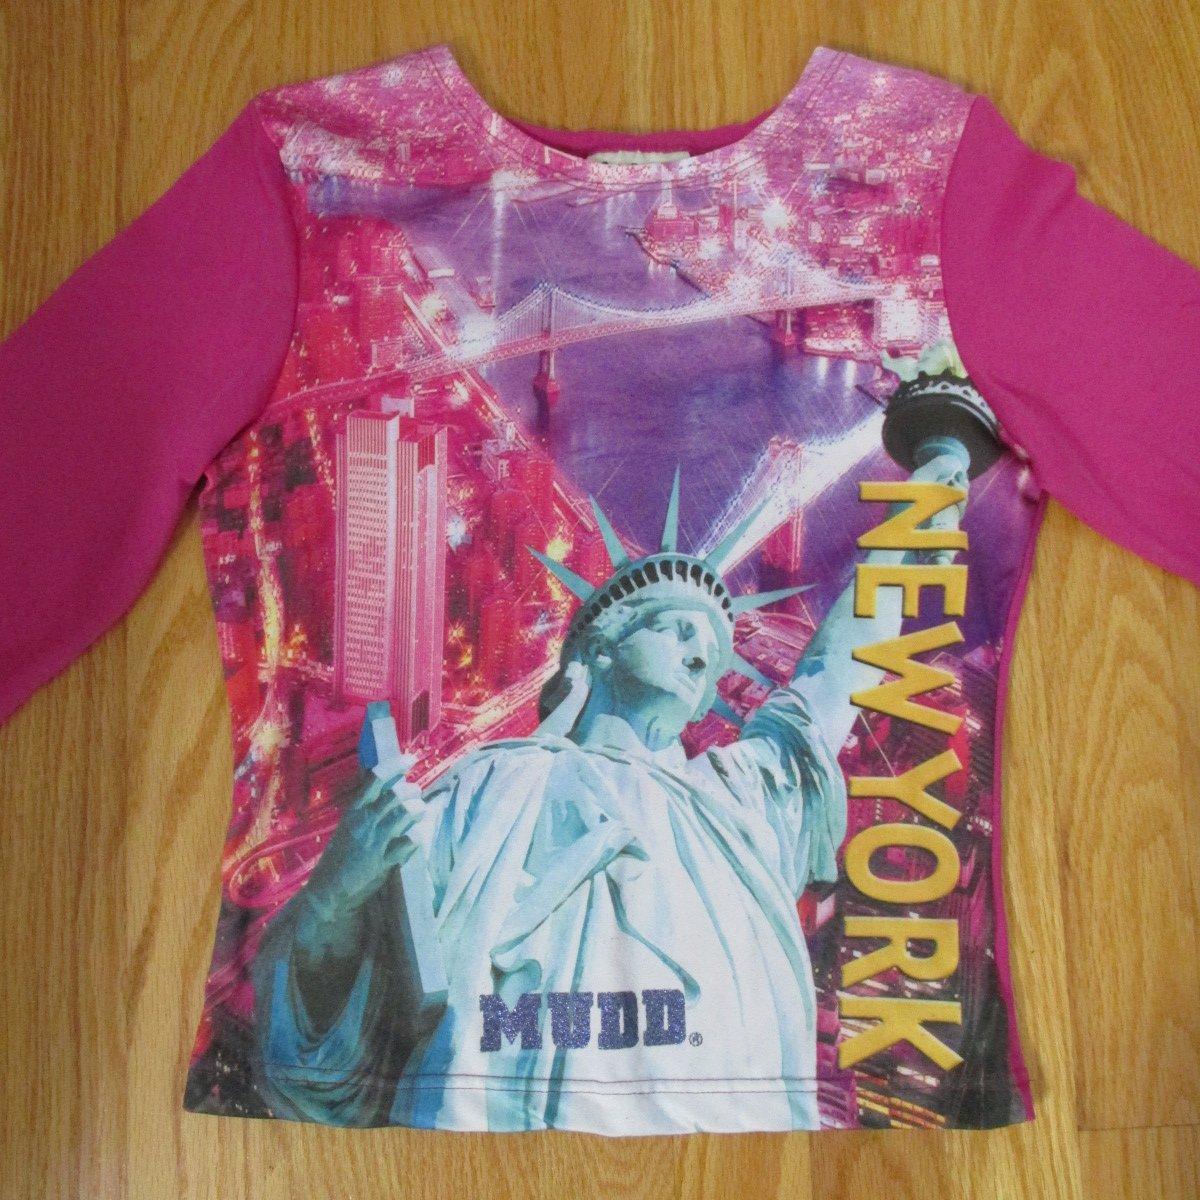 MUDD WOMENS SIZE S TOP FUCHSIA PINK NEW YORK SHIRT STATUE OF LIBERTY